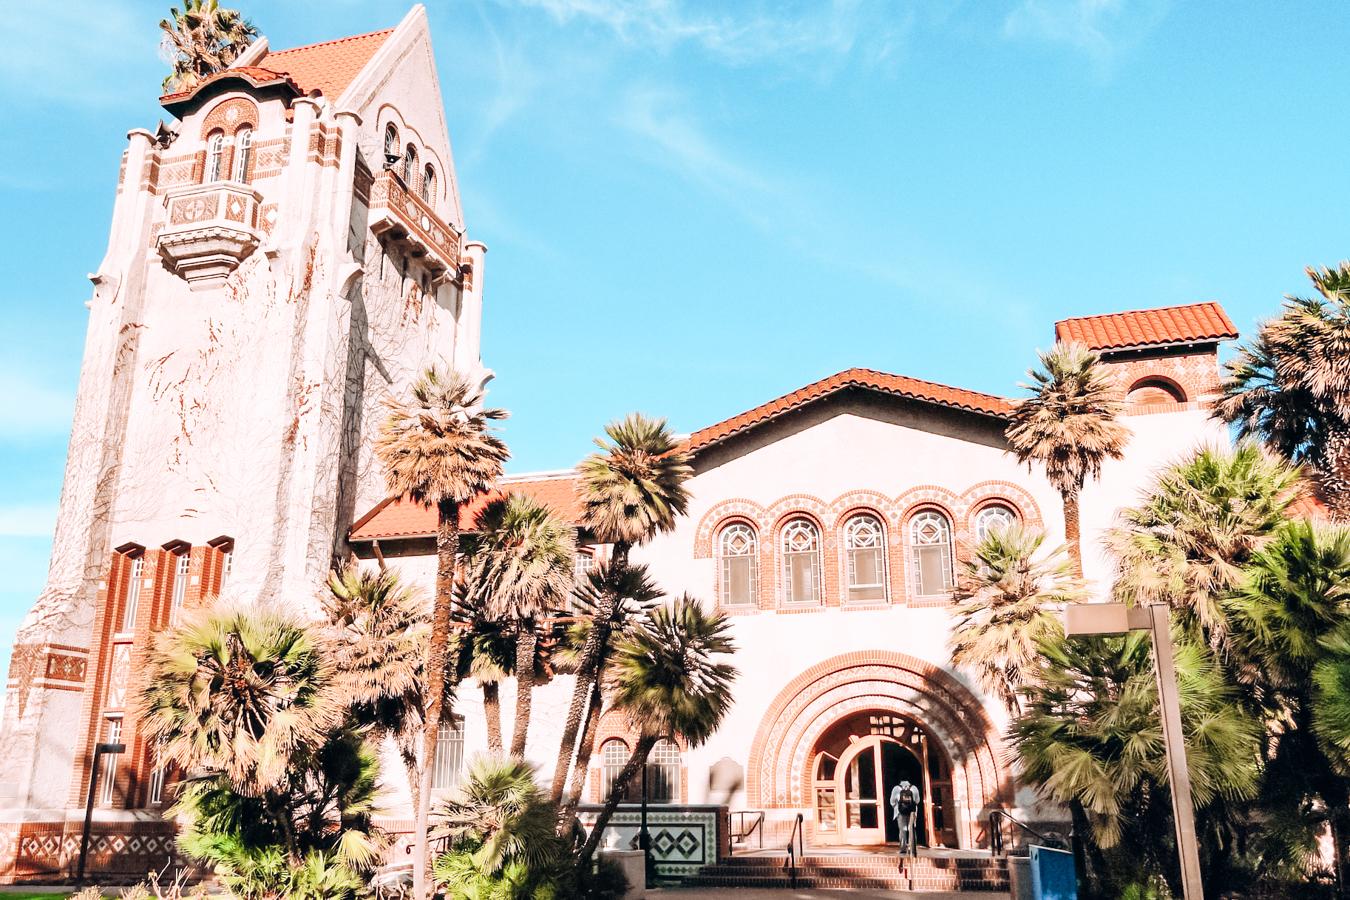 Historic building in San Jose